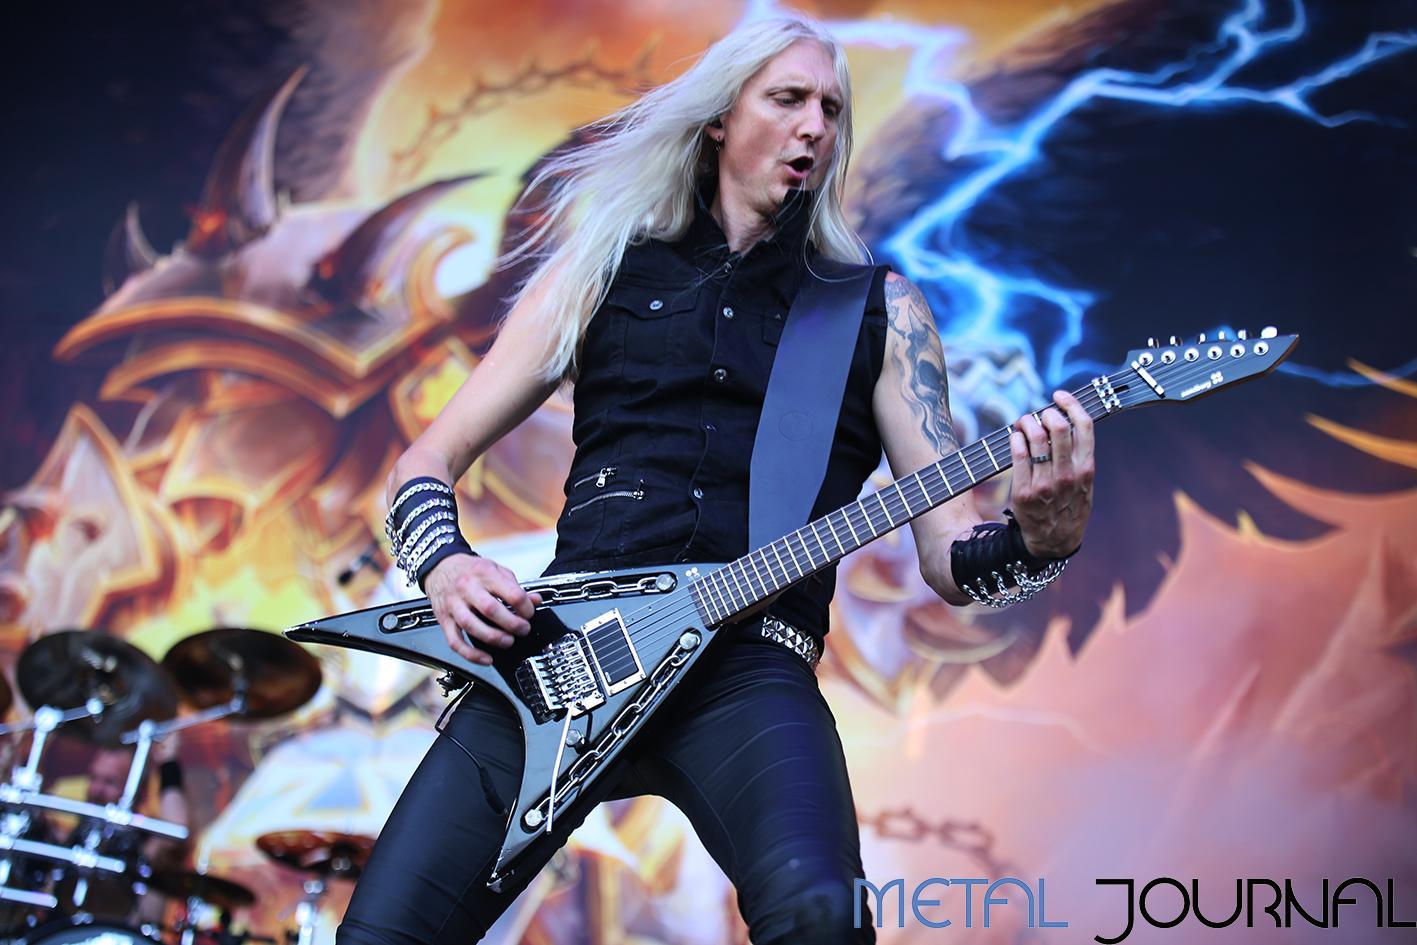 hammerfall - leyendas del rock 2019 metal journal pic 8